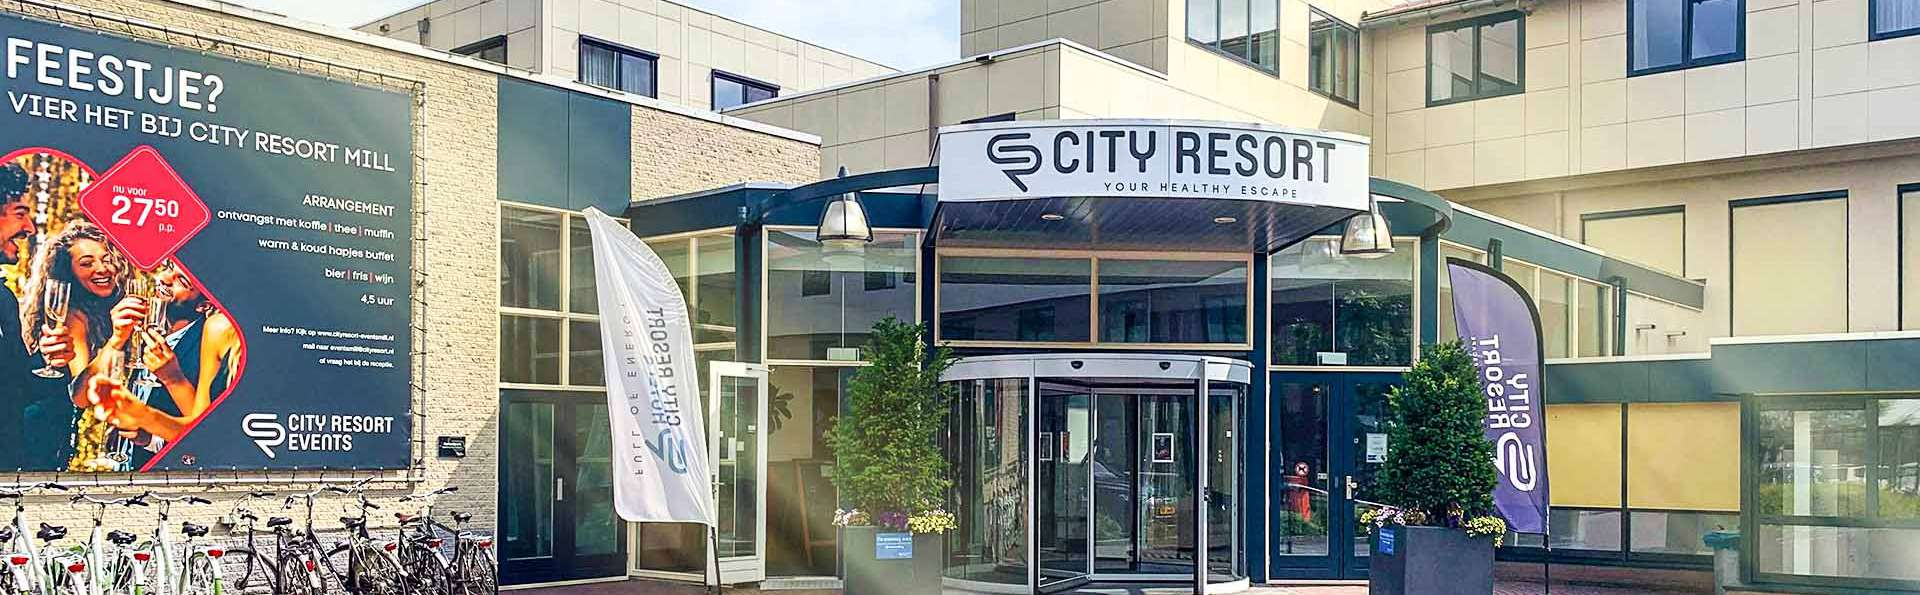 City Resort Hotel Mill - EDIT_foto_ingang_01.jpg